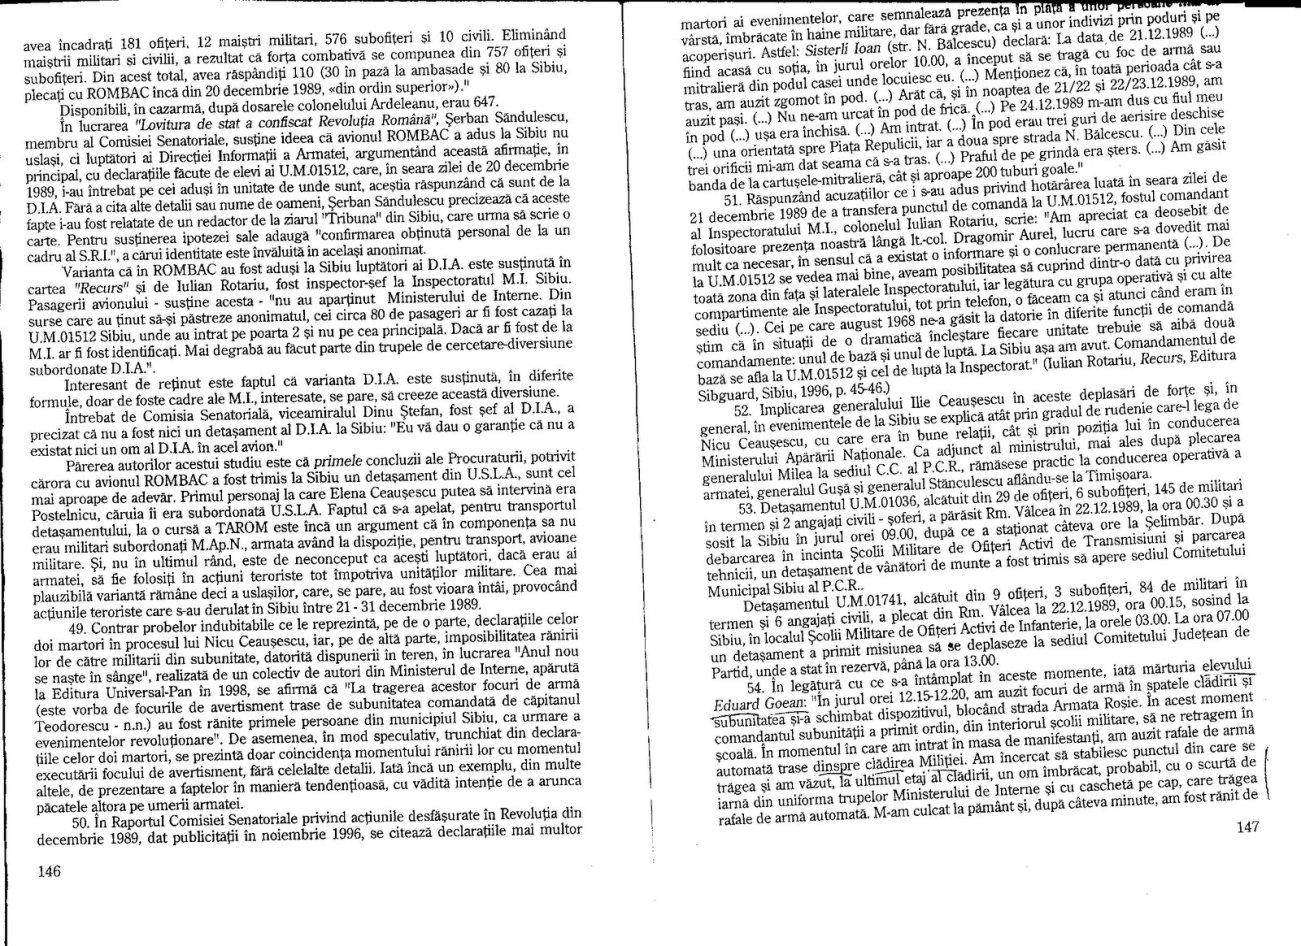 https://romanianrevolutionofdecember1989.files.wordpress.com/2010/04/top-37.jpg?w=1301&h=947